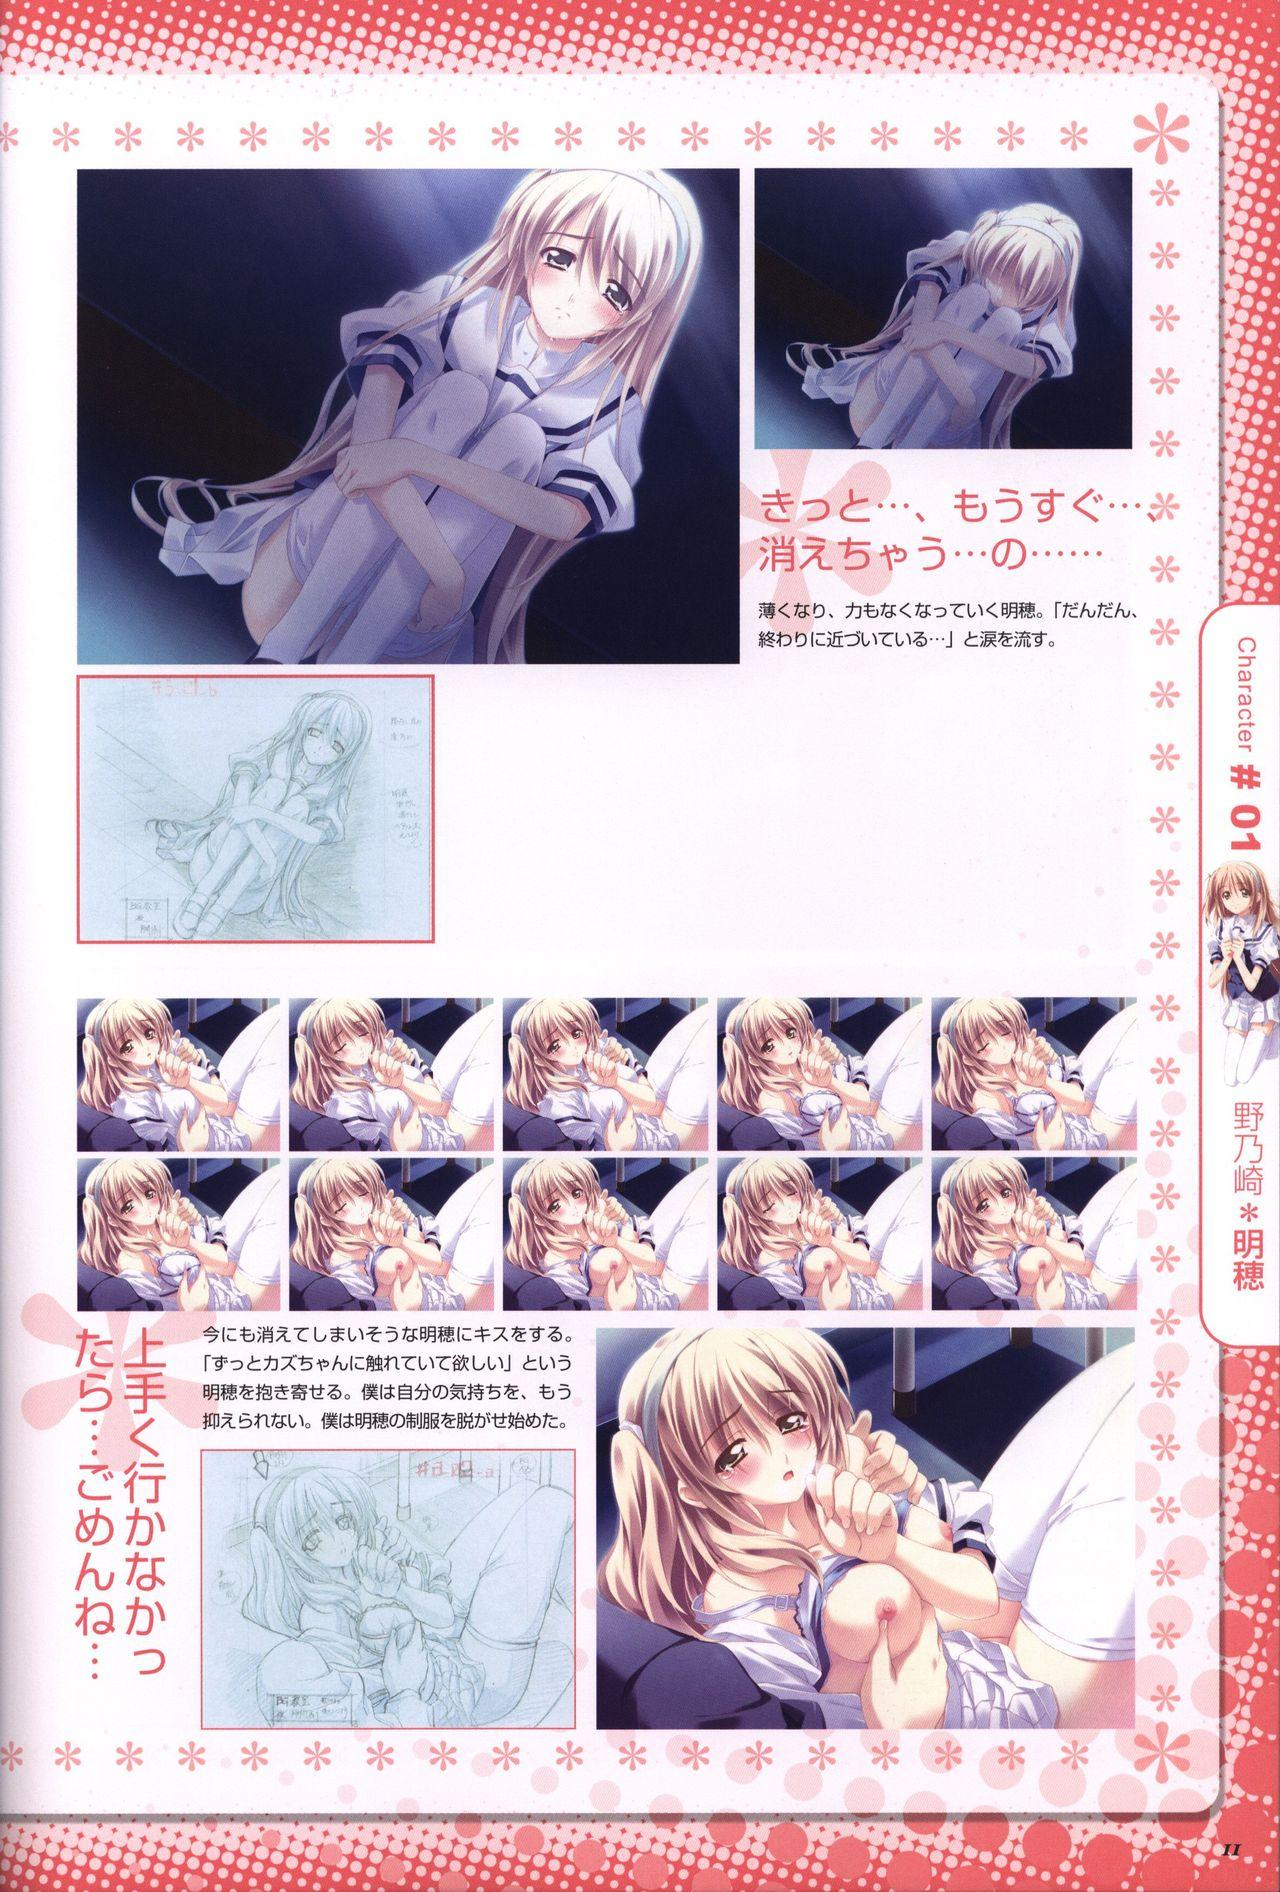 Moshimo Ashita ga Harenaraba official fanbook 11